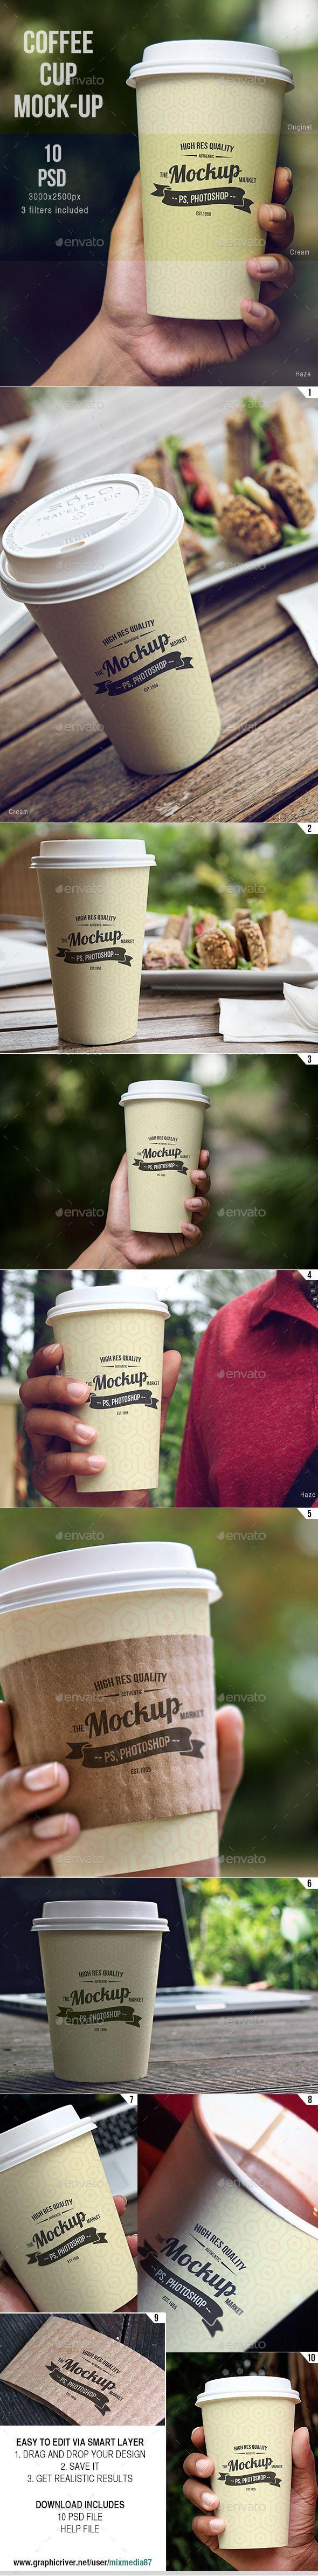 Coffee Cup Mockup   #coffeecupmockup #mockup   Download: http://graphicriver.net/item/coffee-cup-mockup/8861003?ref=ksioks